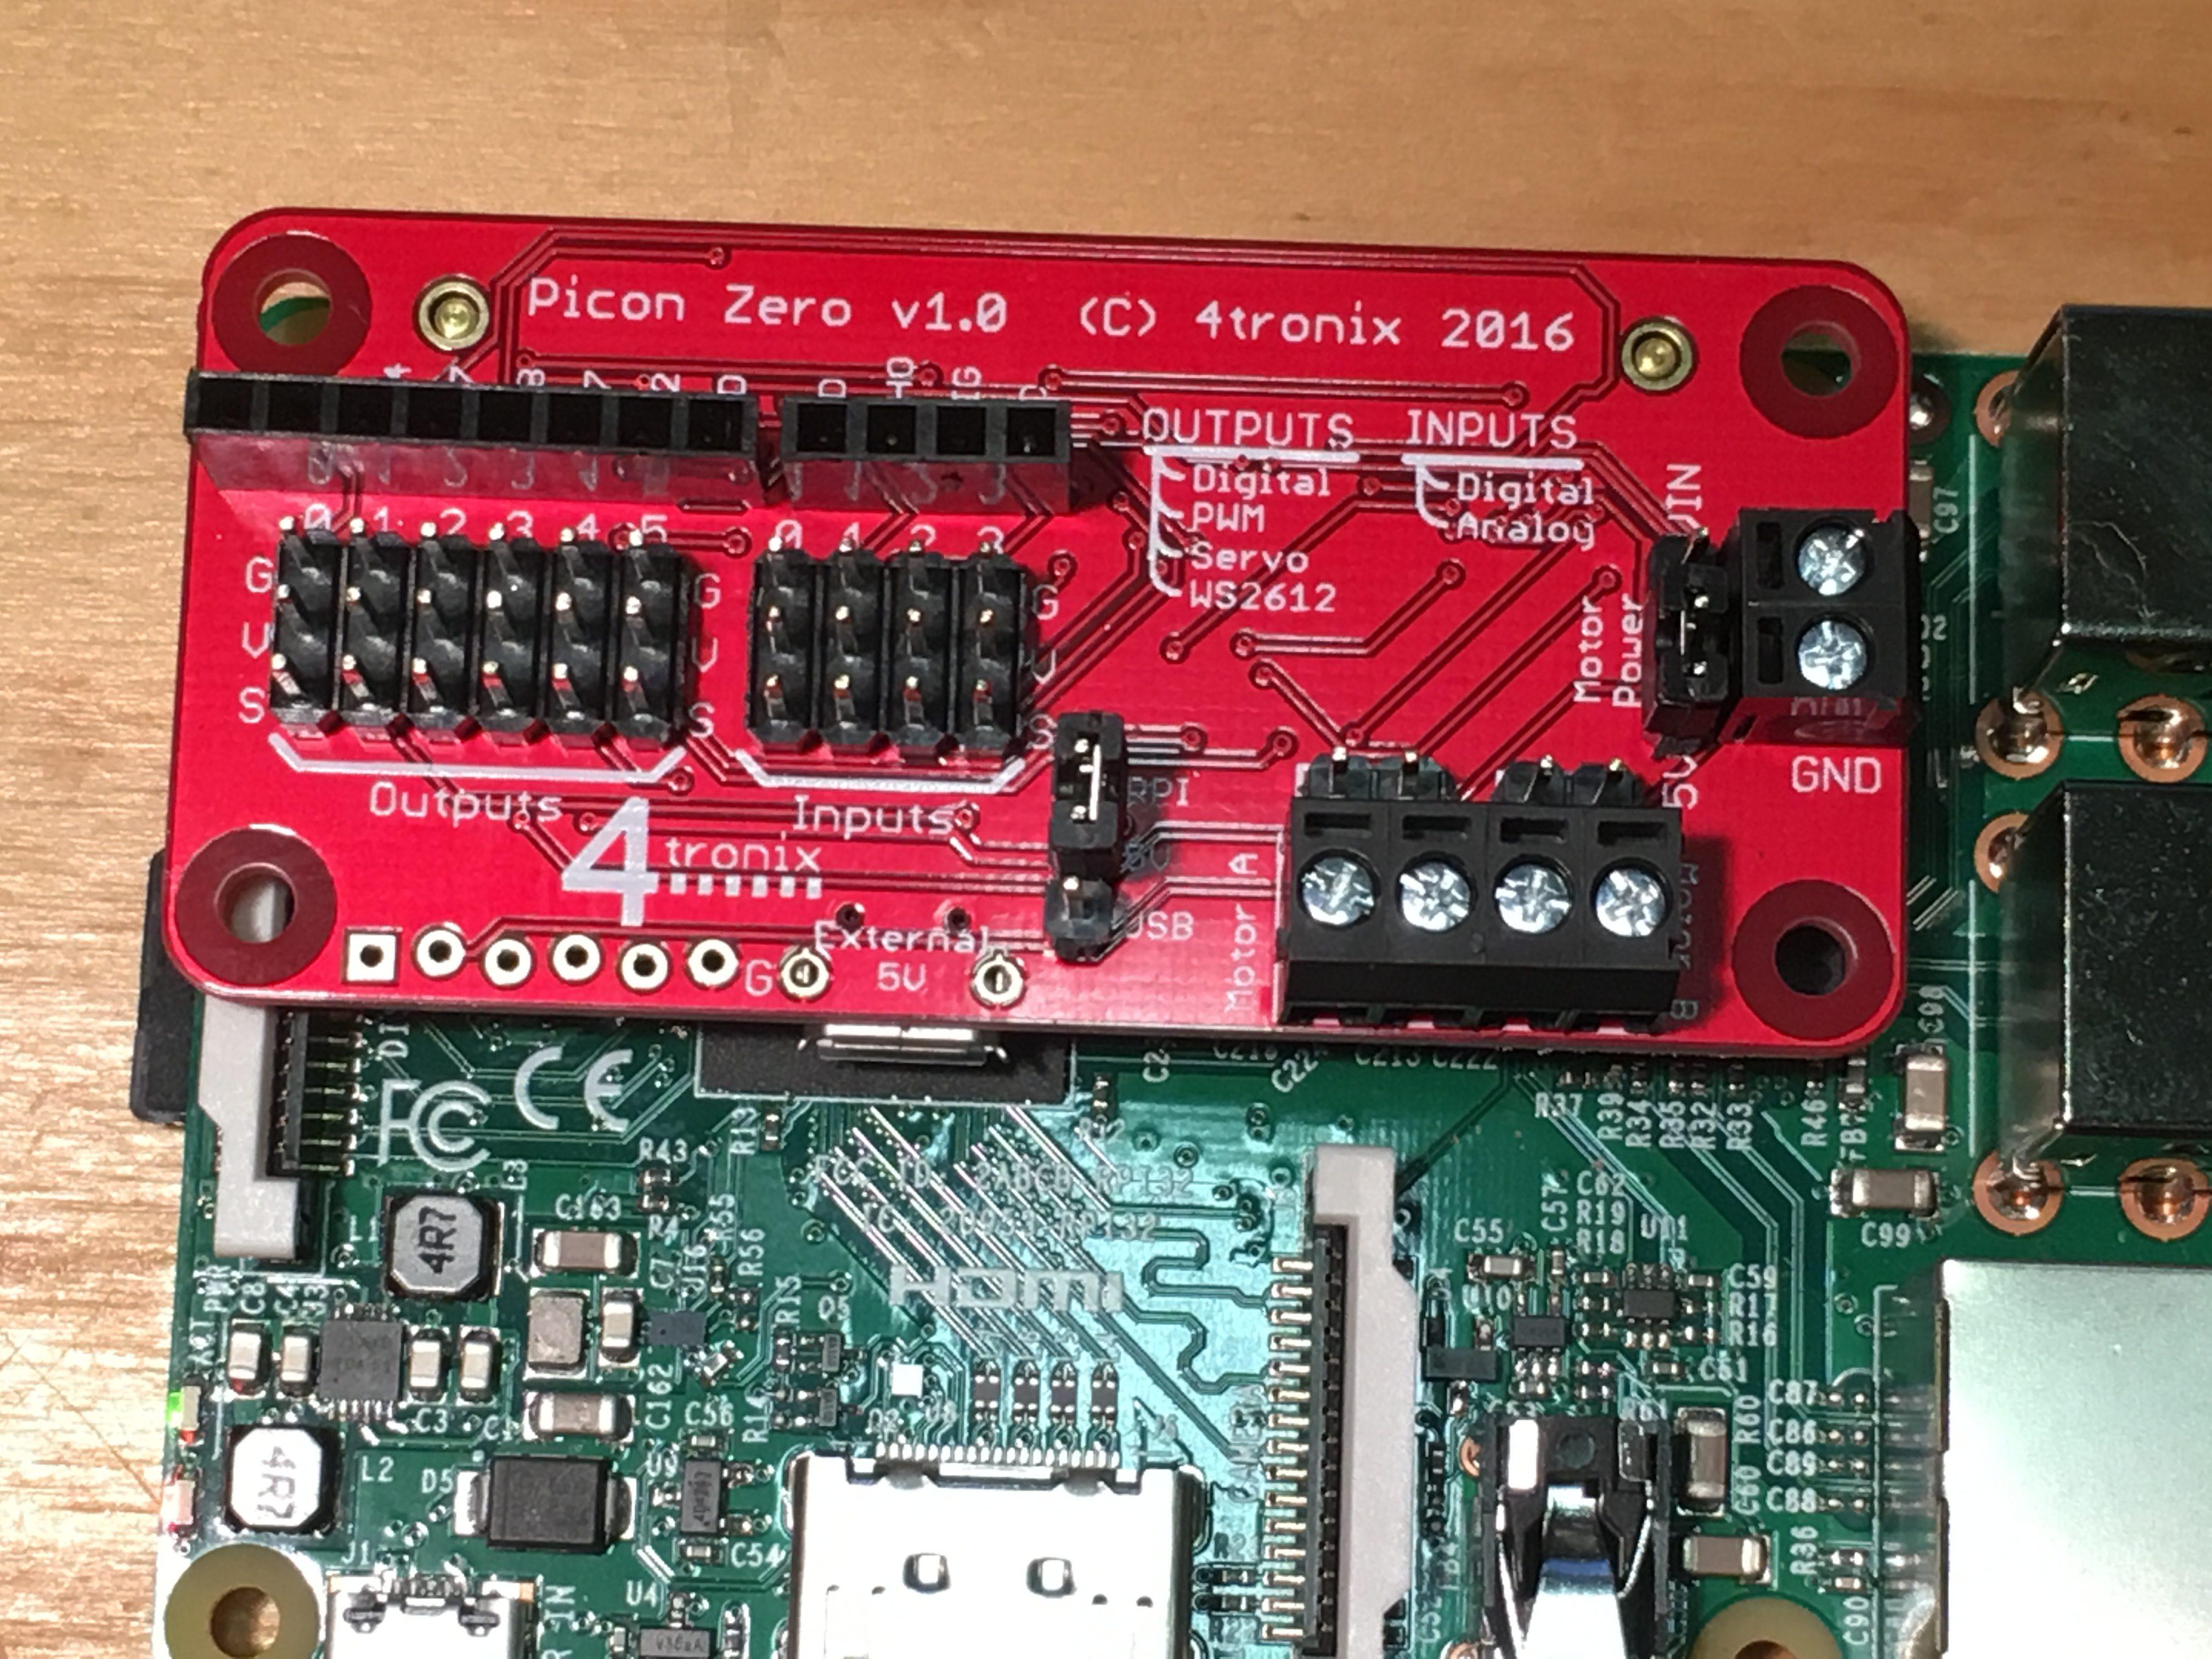 Ps3 Wireless Controlled Mearm Using Pi And 4tronix Picon Zero Board